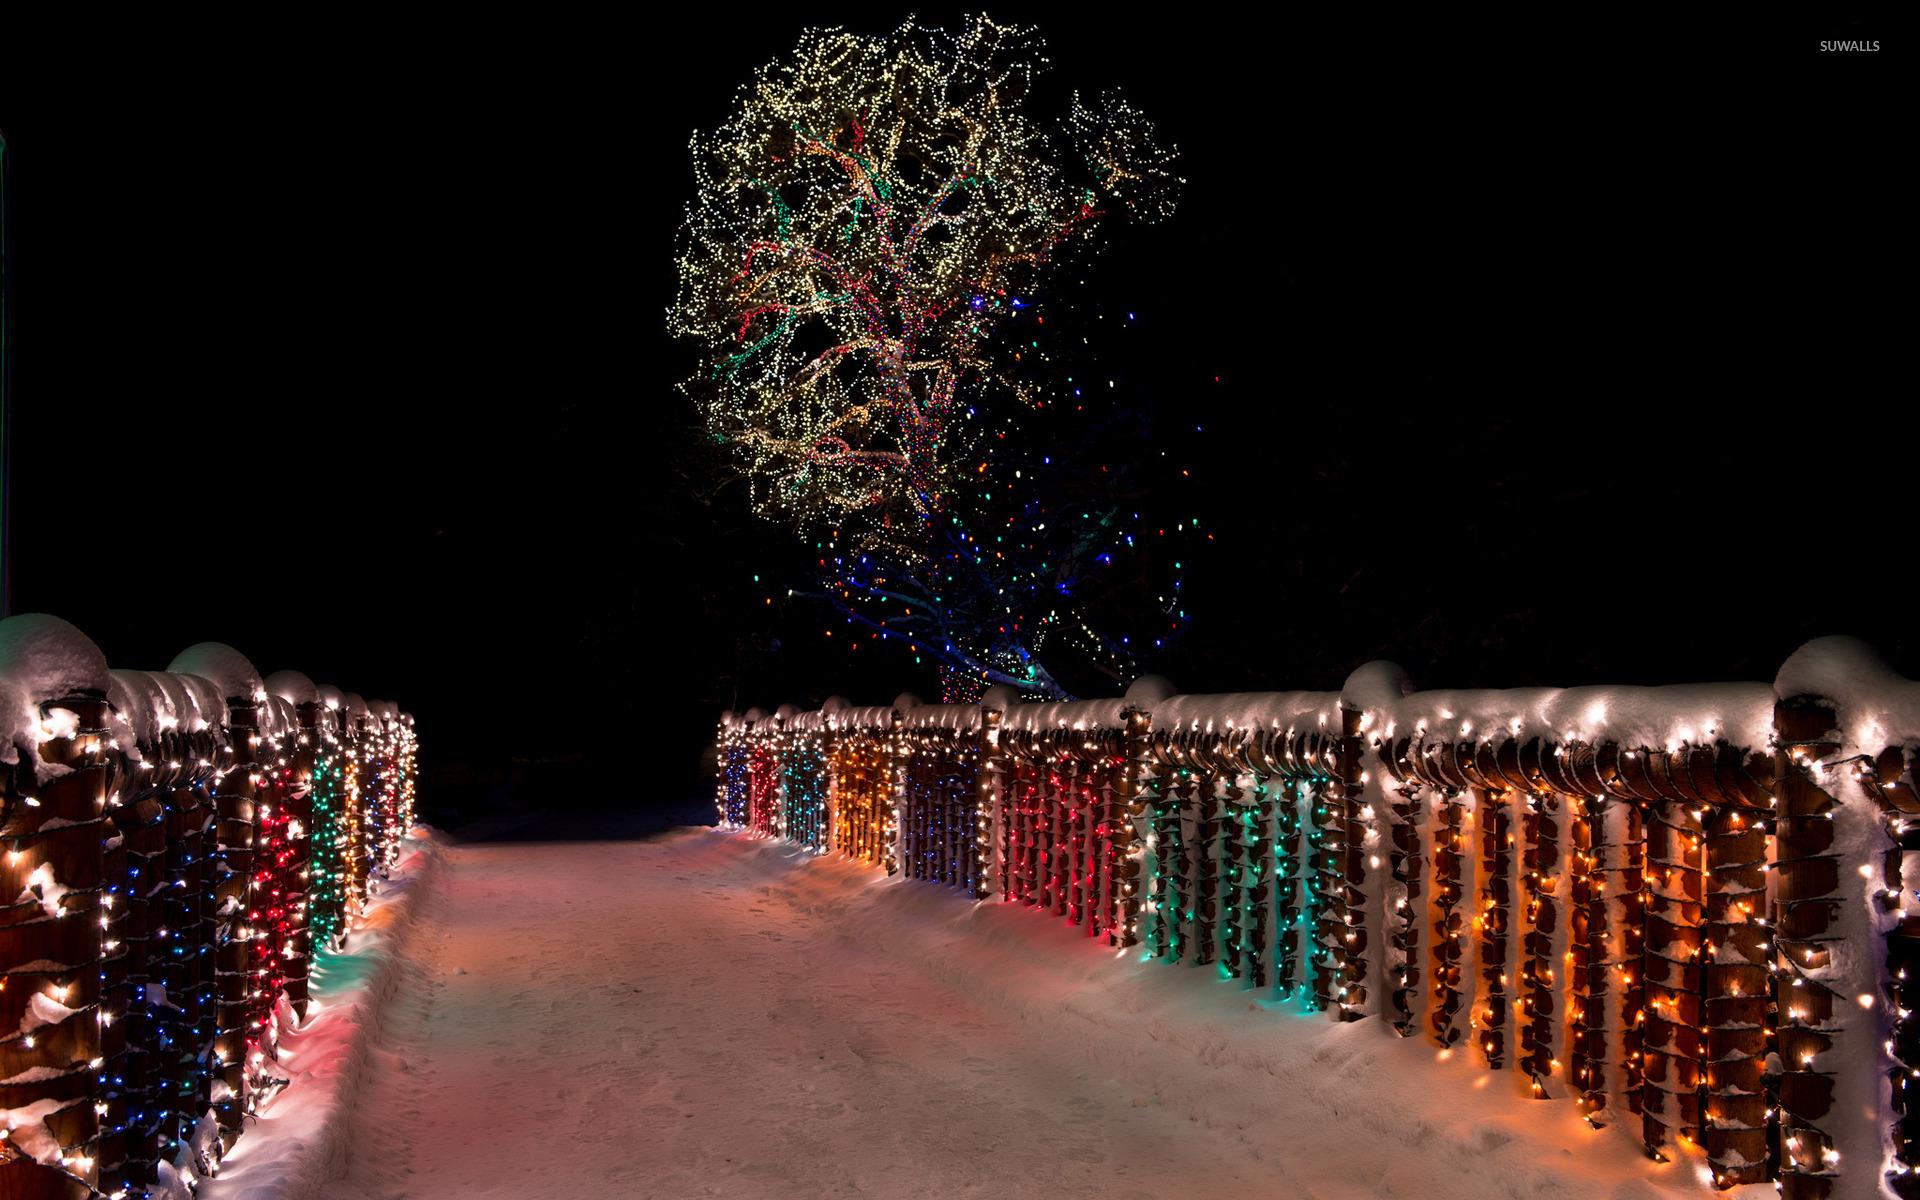 colorful christmas lights on the snowy bridge 45908